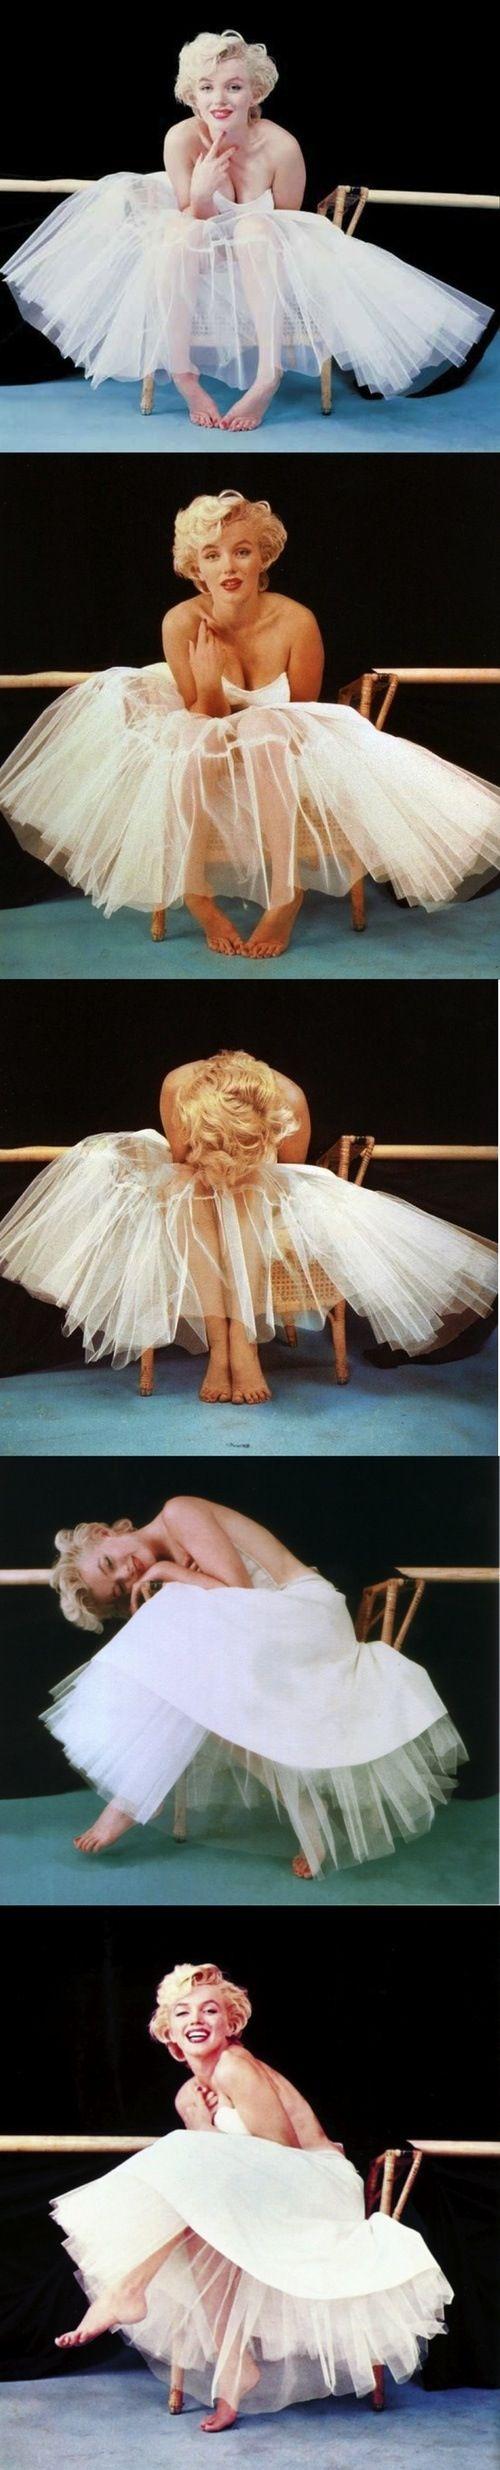 broken ballerina, Marilyn was the girl who never grew up. Timeless prom queen #topshoppromqueen